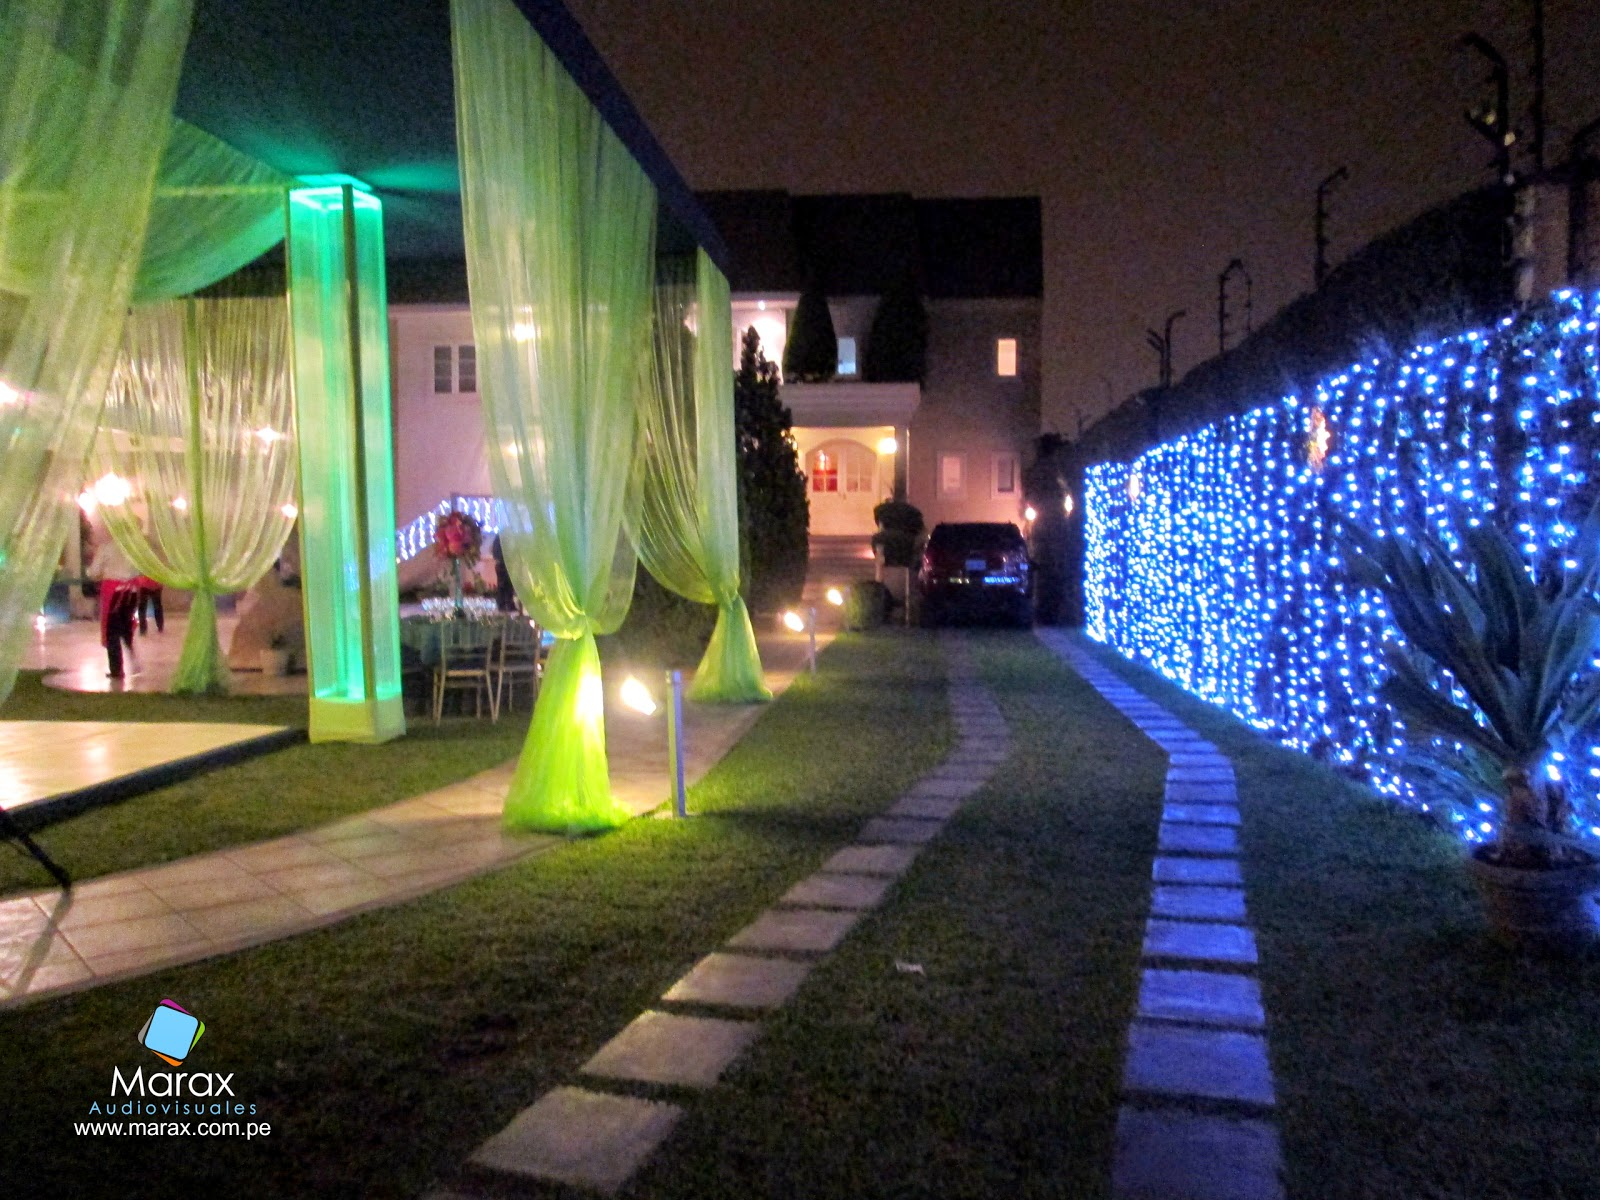 Marax audiovisuales cumplea os en la molina - Luces led jardin ...